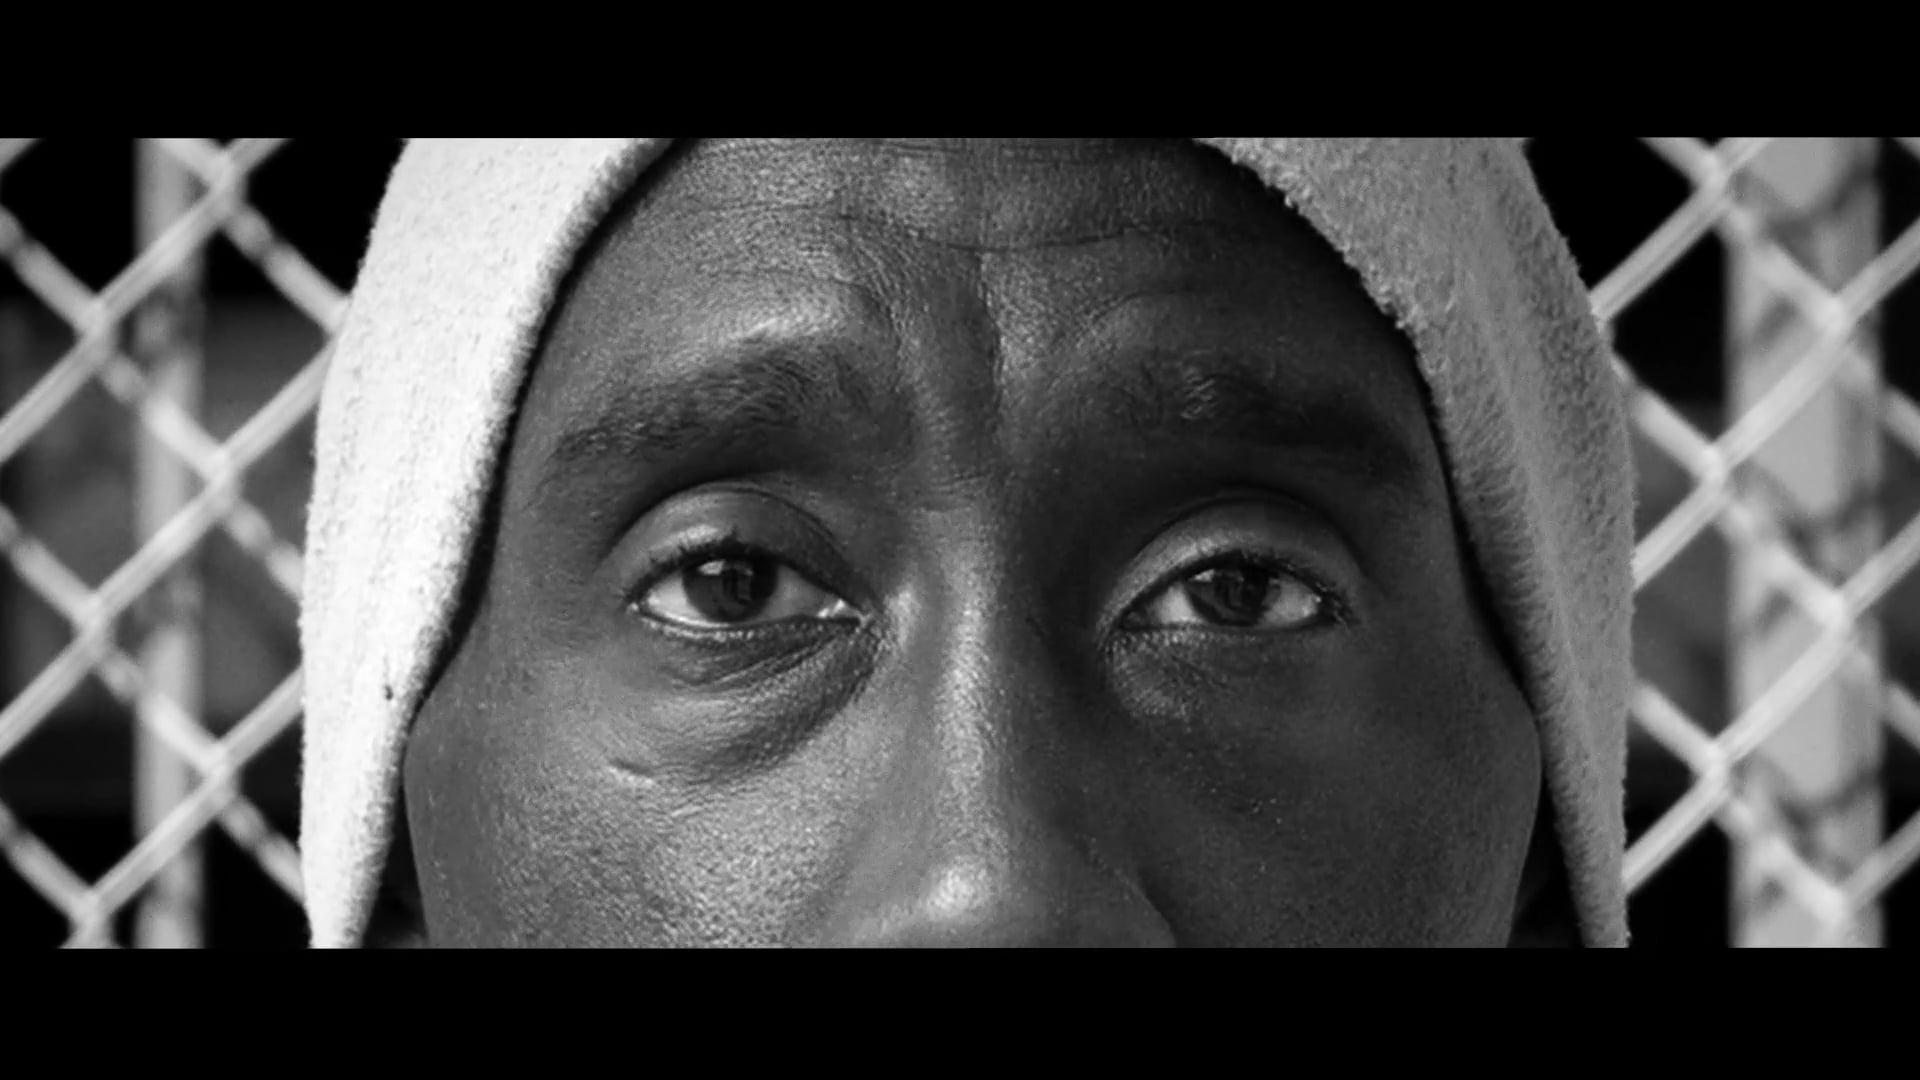 Adidas - Stories of Transformation